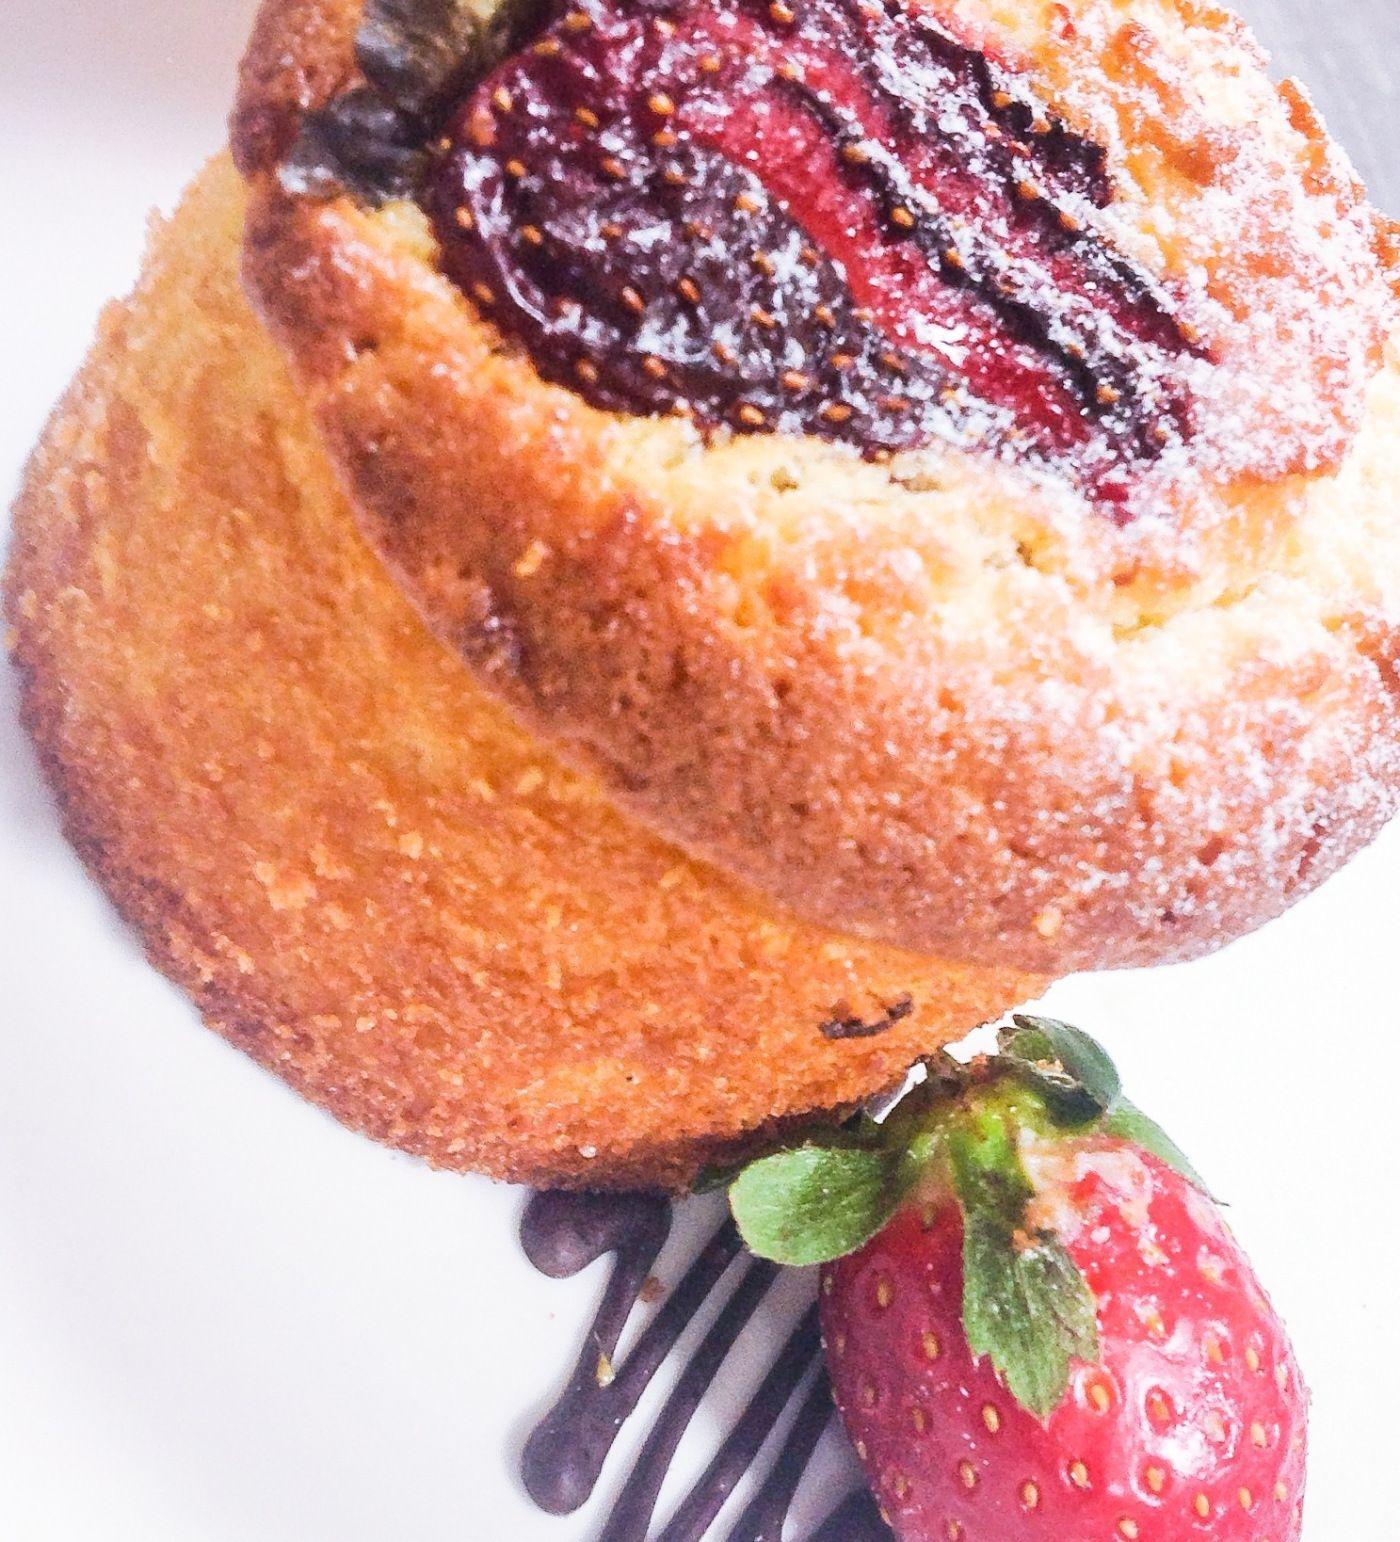 Strawberry Frangipane with a gluten free option...